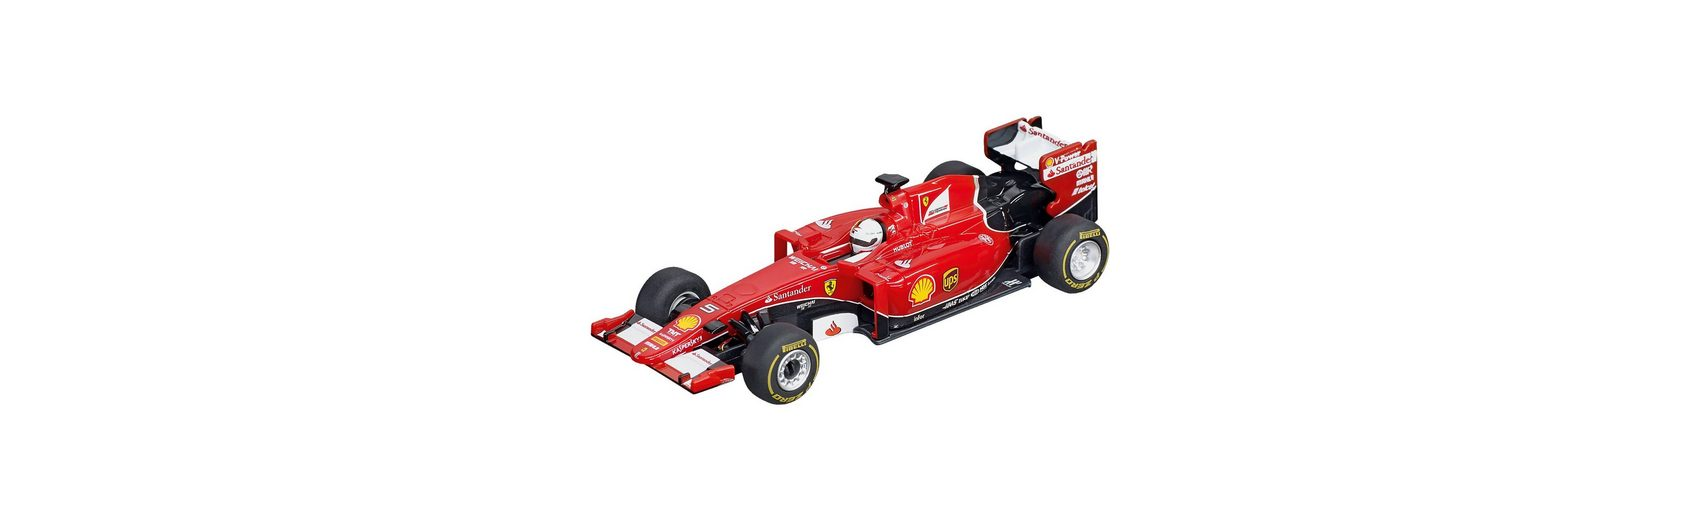 "Carrera Digital 143 41388 Ferrari SF 15T ""S. Vettel, No.5"""